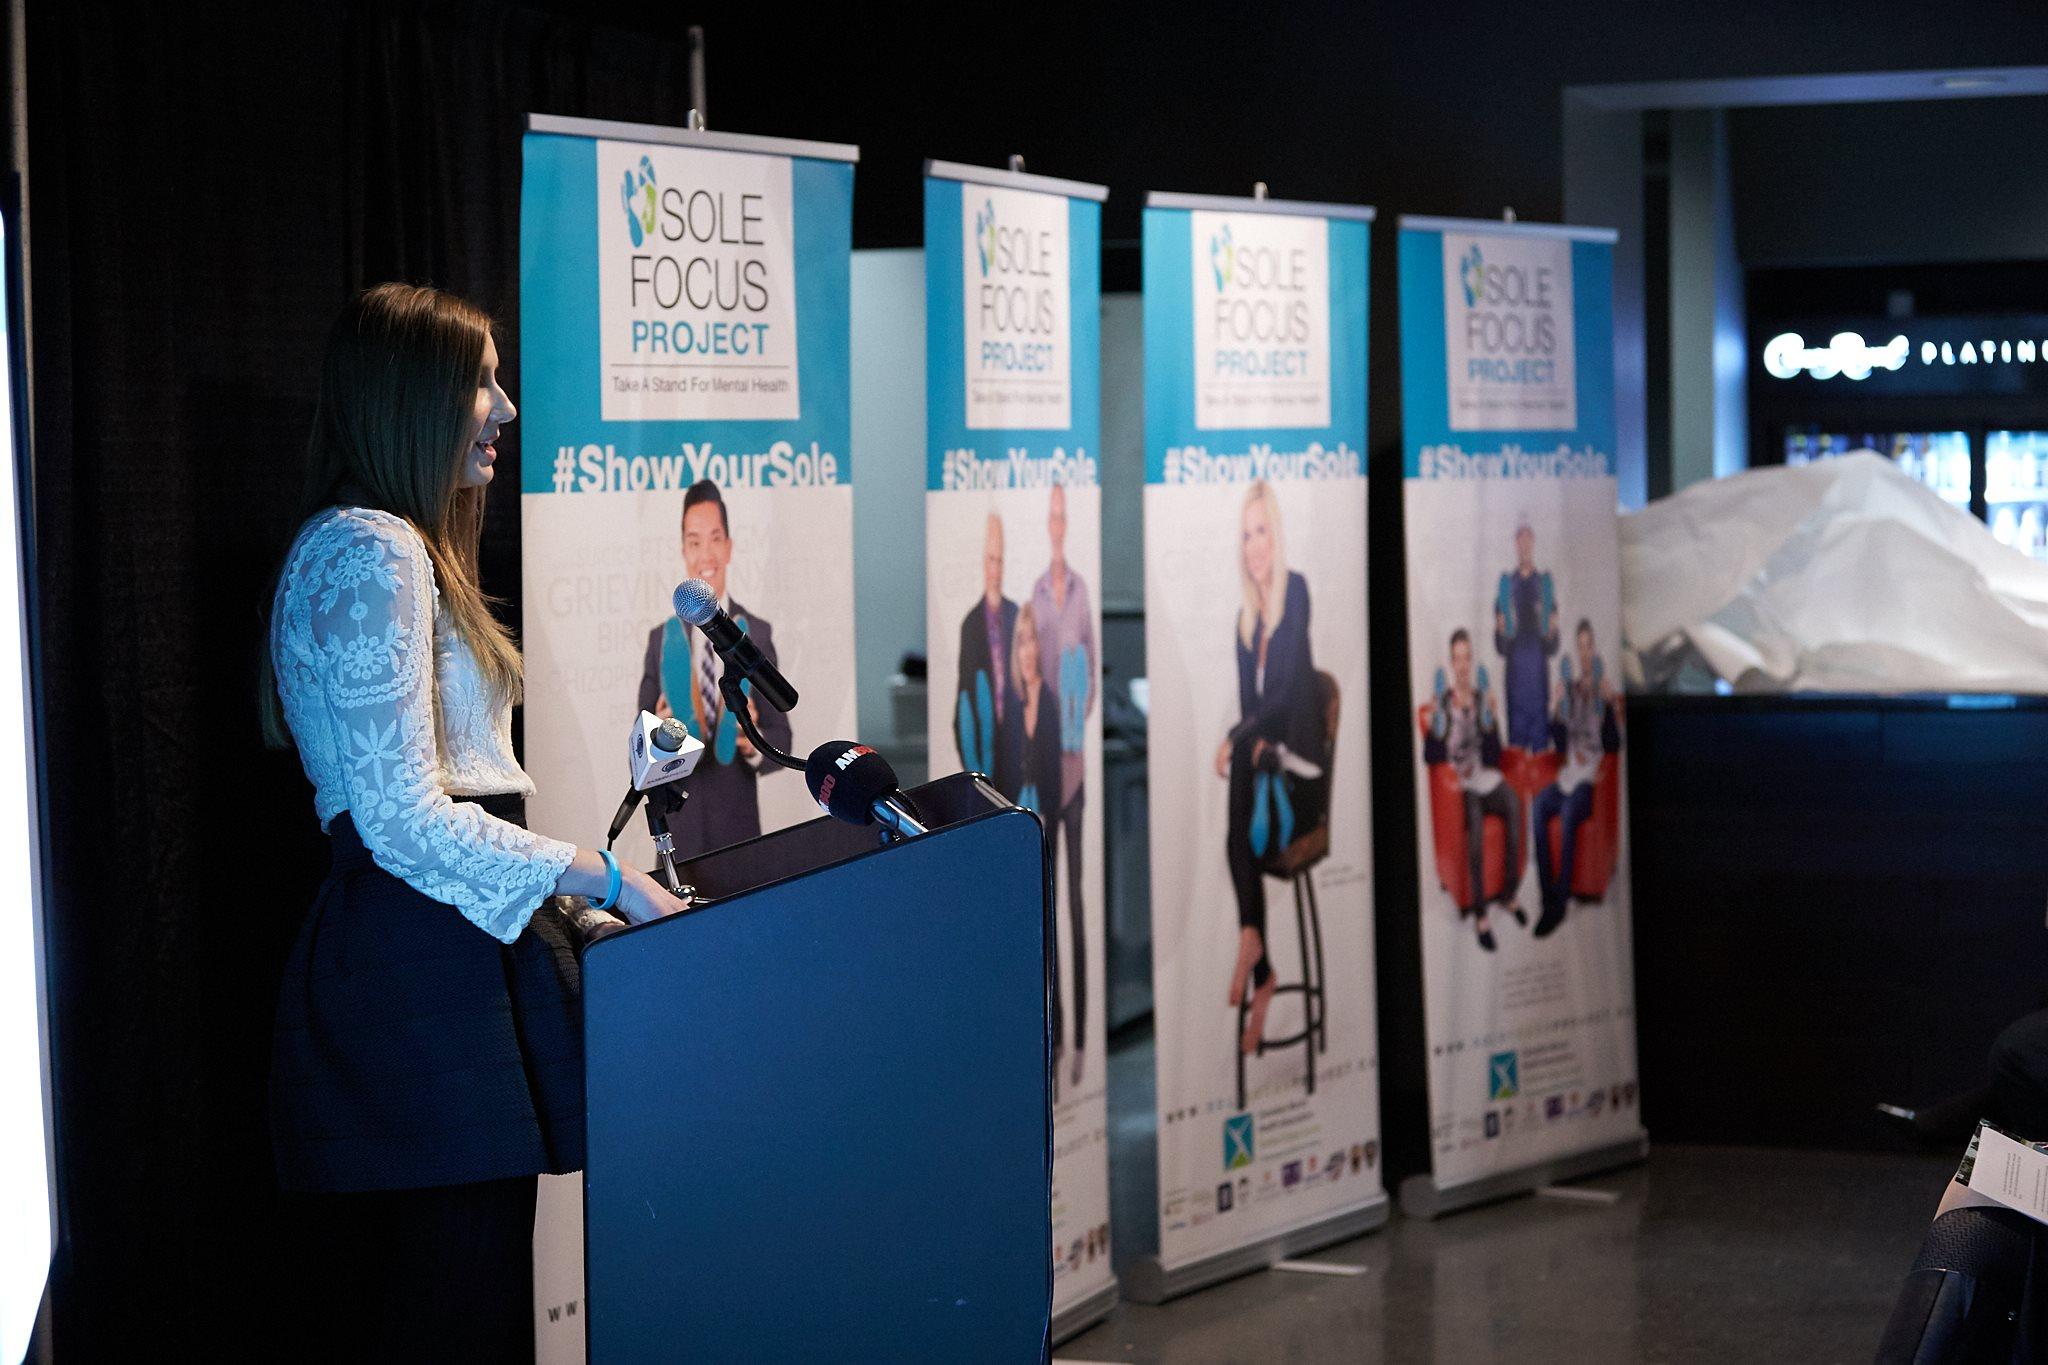 Sole Focus Launch